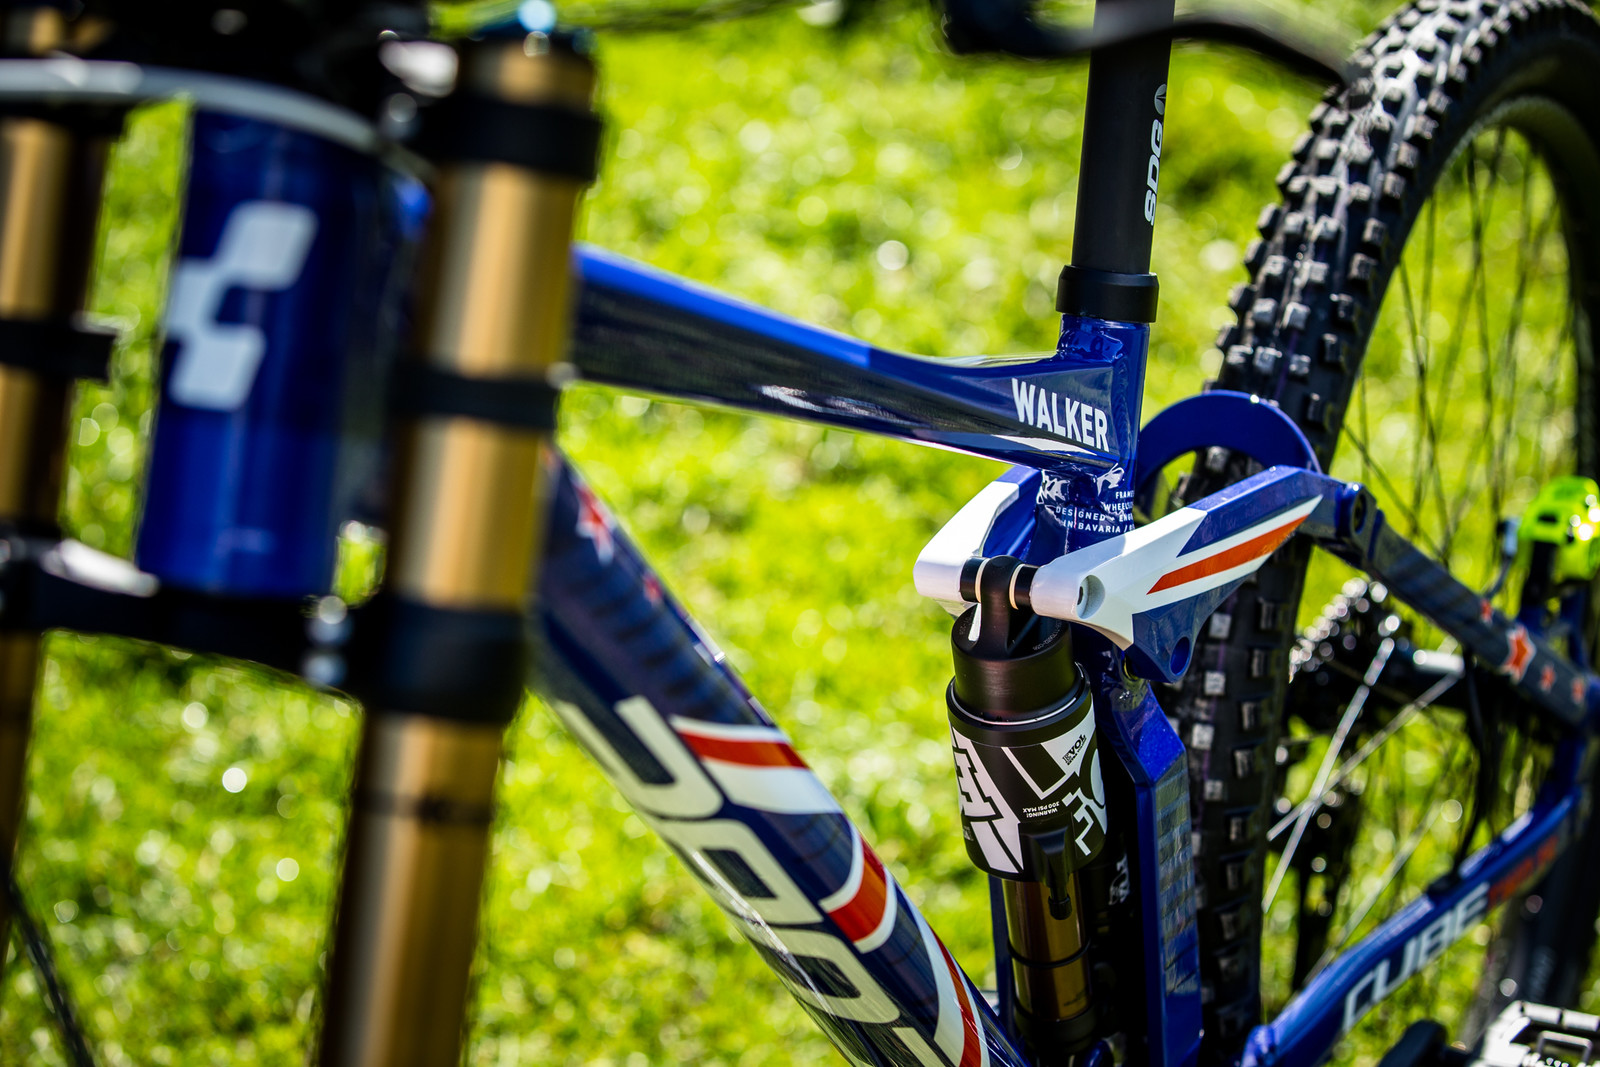 Slick - WORLD CHAMPS BIKES - Matt Walker and Max Hartenstern's Cubes - Mountain Biking Pictures - Vital MTB